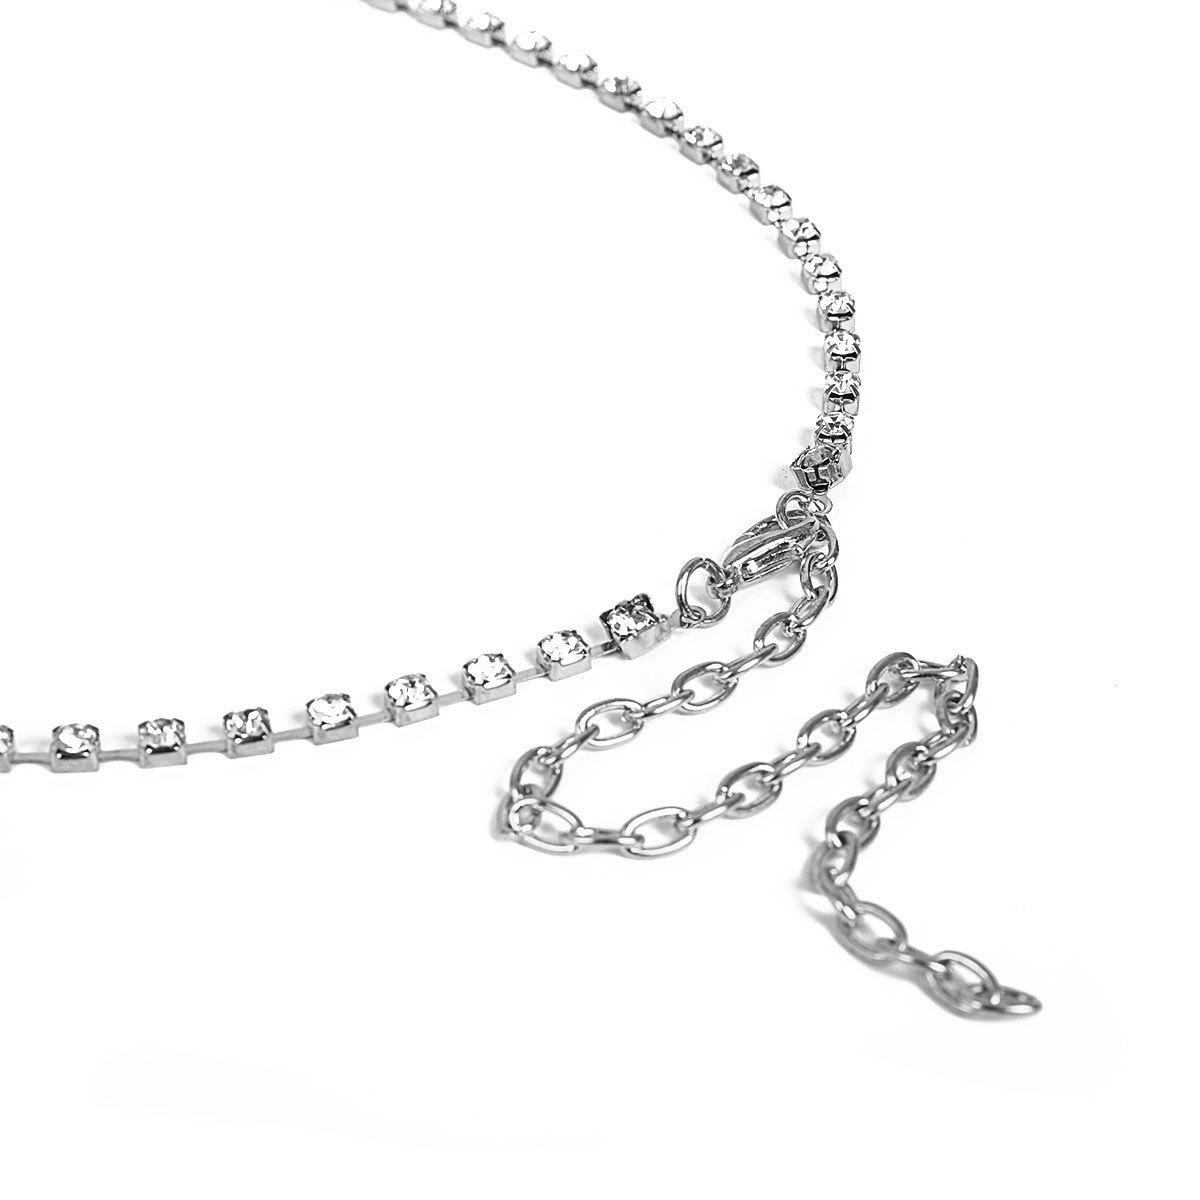 Alloy Fashion Geometric Body jewelry  (Leg chain single alloy) NHXR2352-Leg-chain-single-alloy